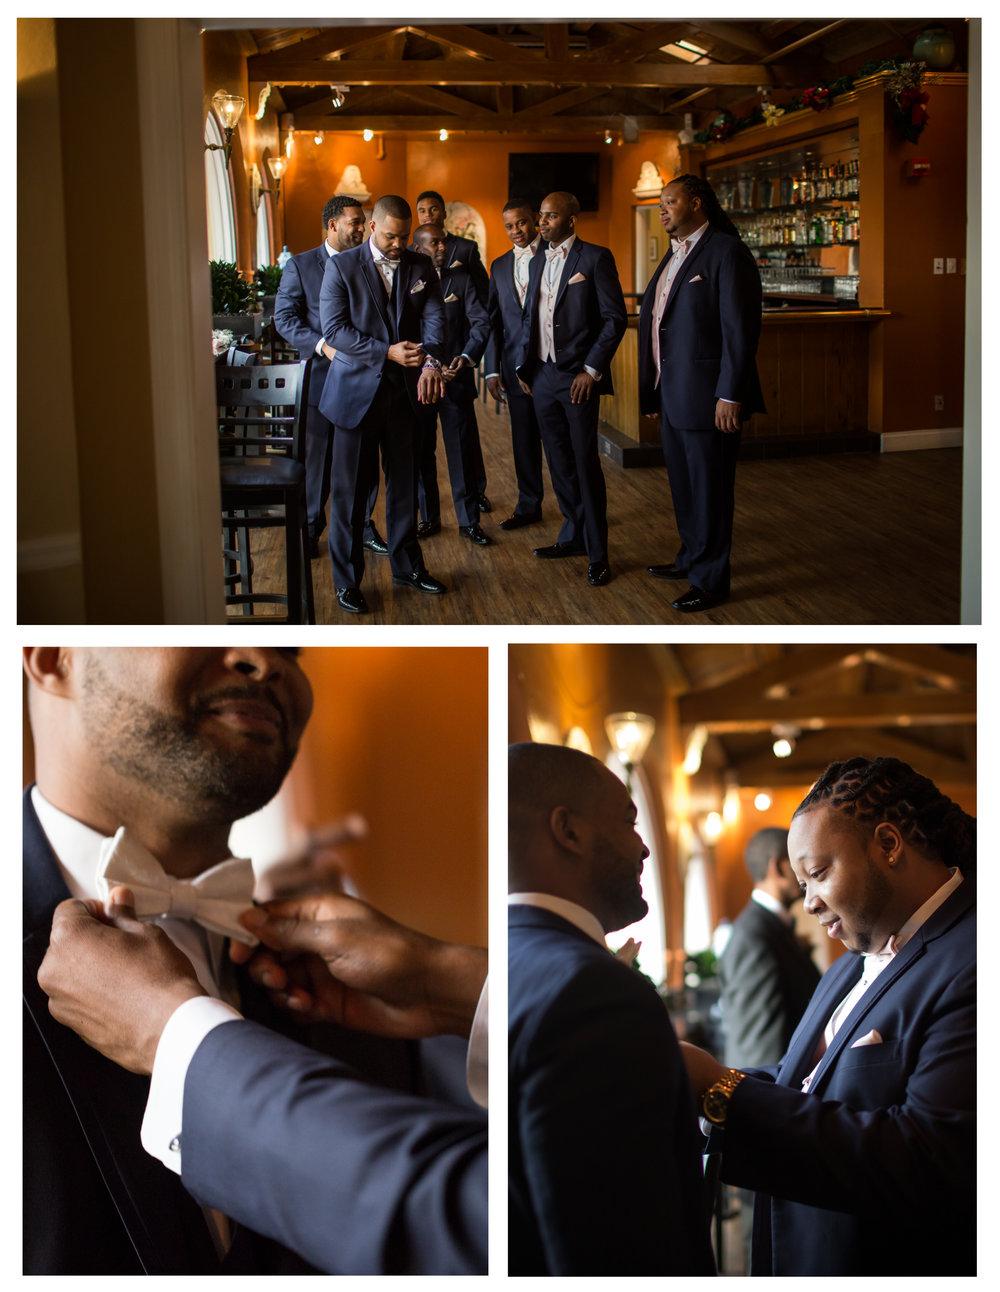 Benvenuto_wedding_Boynton_Beach_Jodi_Fjelde_Photography_Nikki_Otis_married_7.jpg